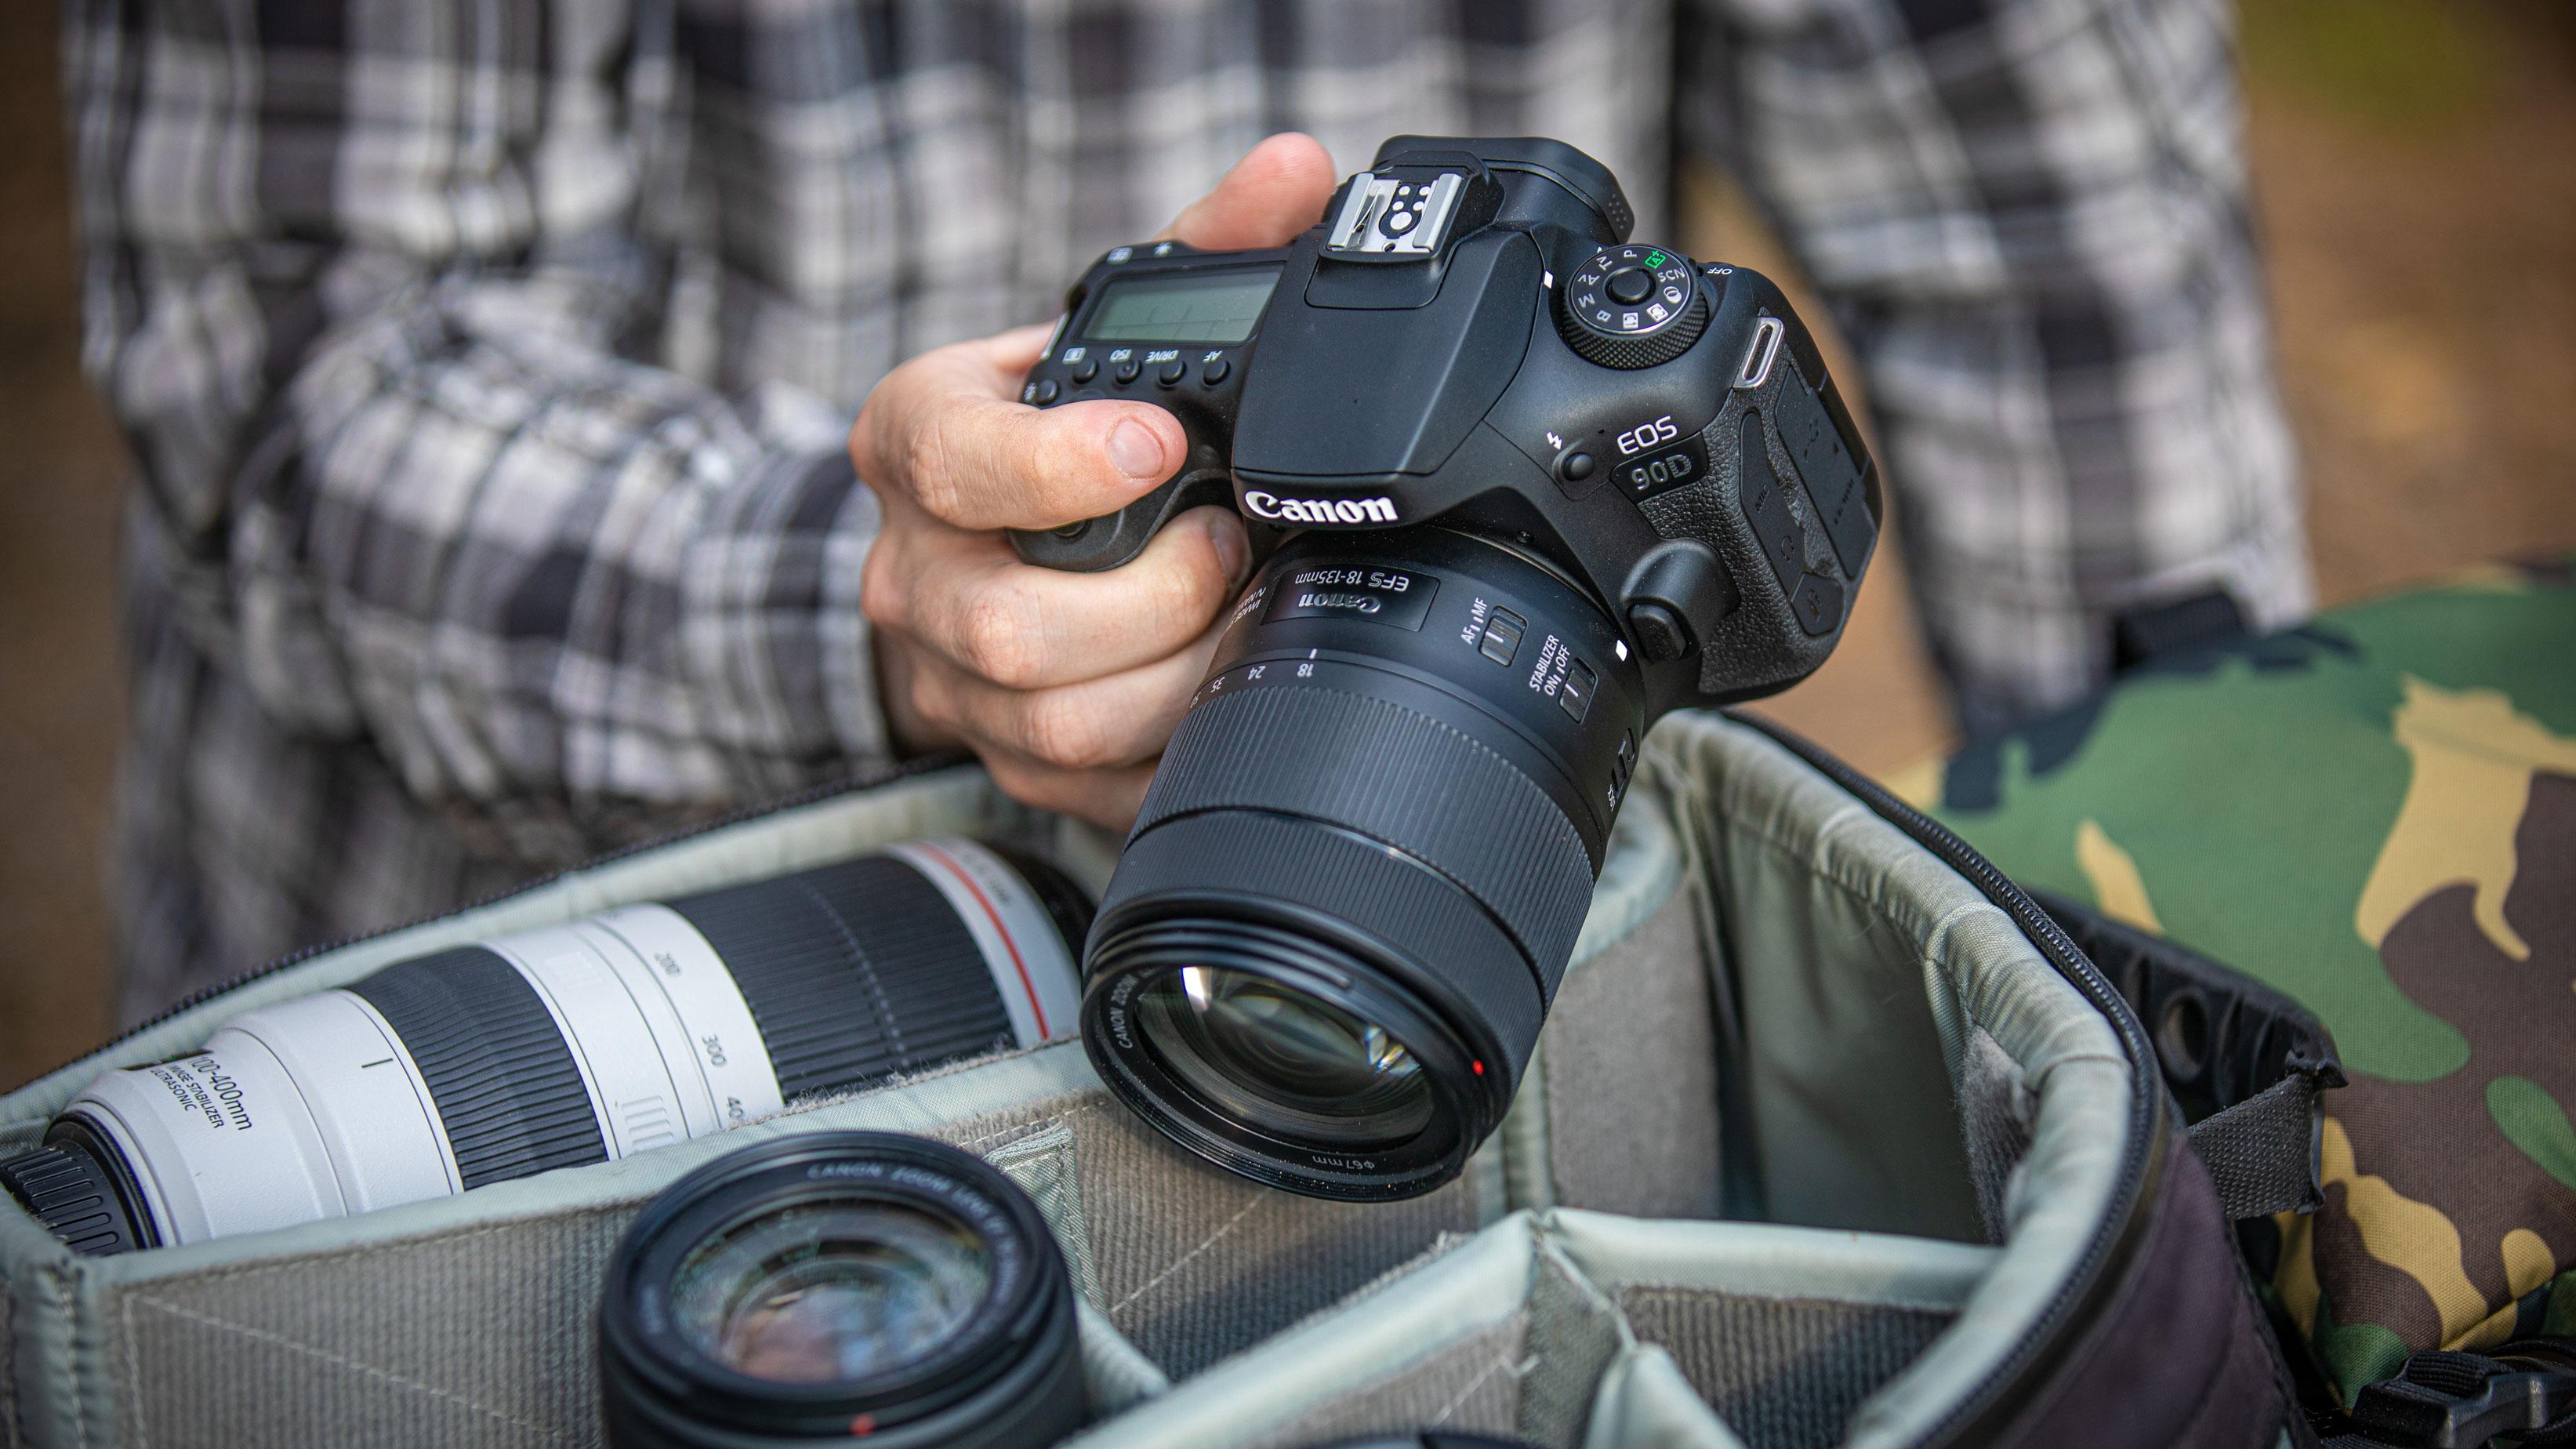 The Best Canon Camera In 2020 Digital Camera World